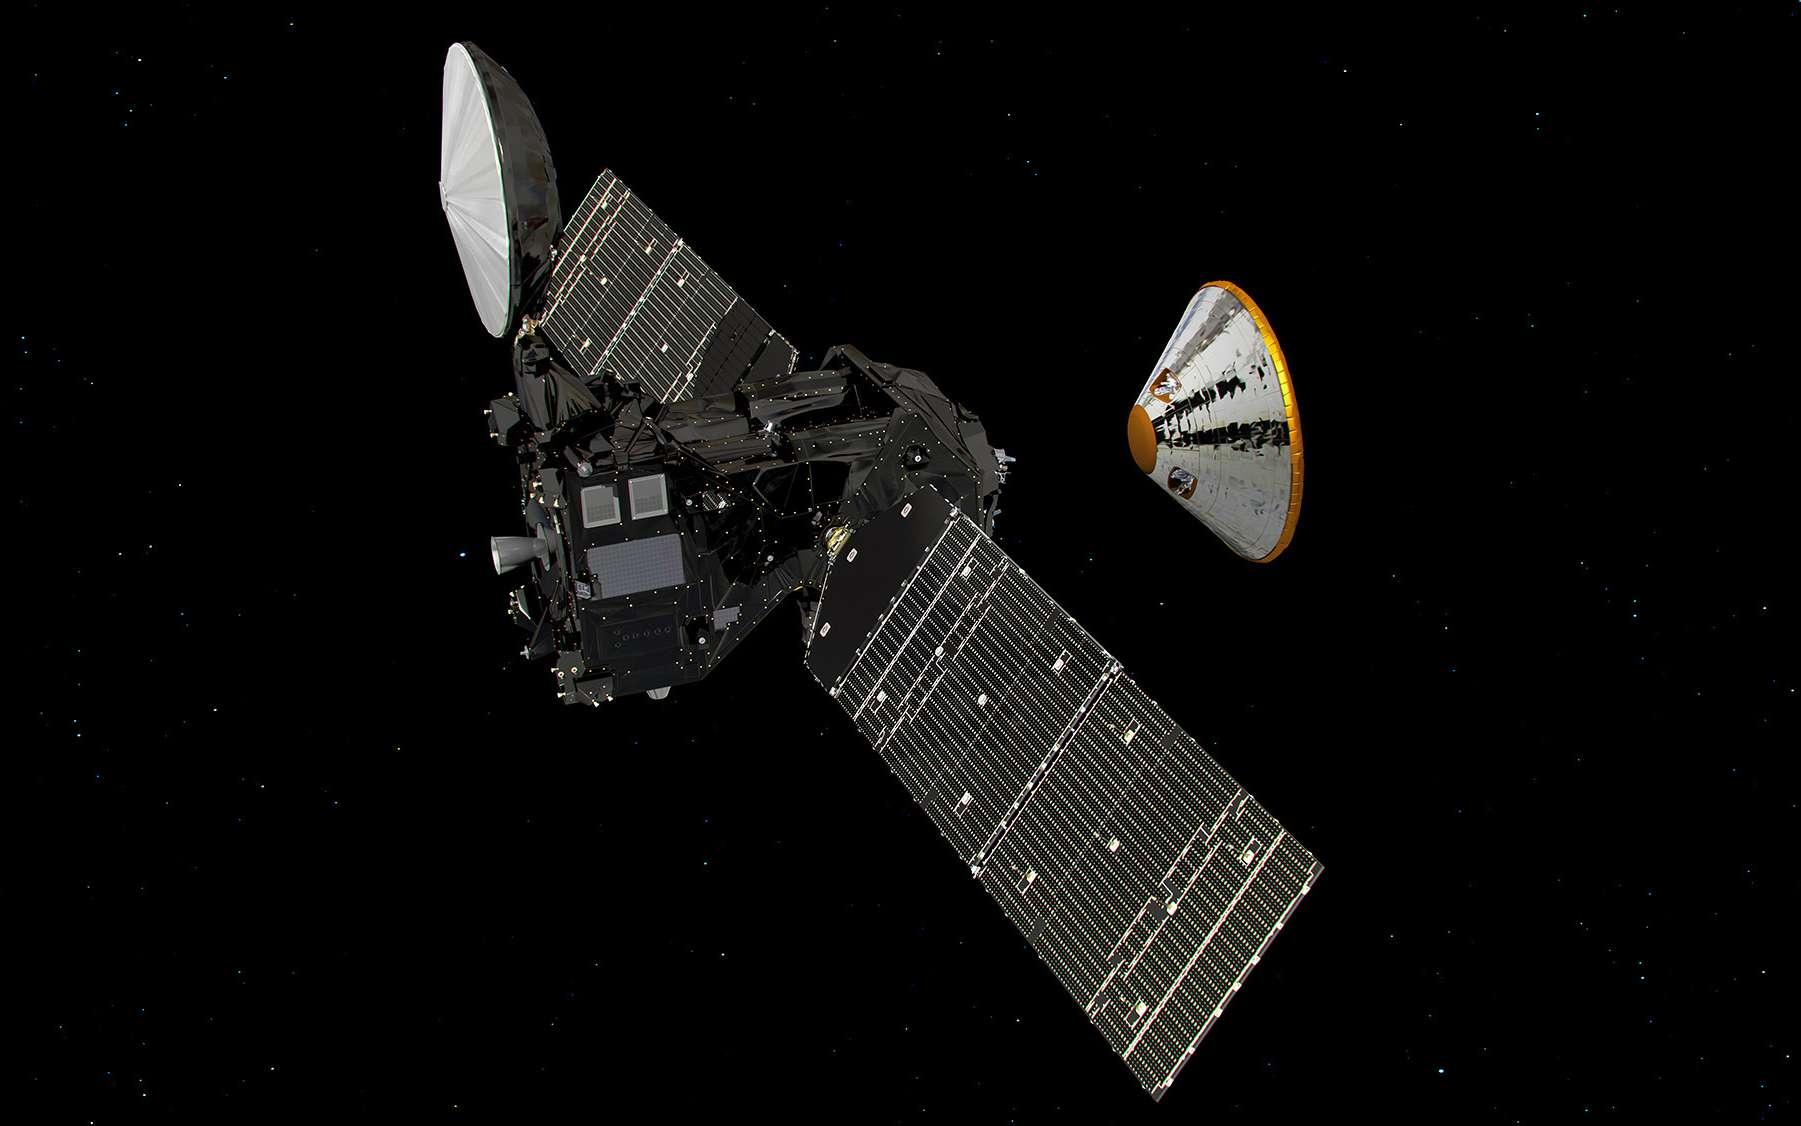 Illustration de la séparation du module Schiaparelli de la sonde TGO. © Esa, ATG medialab